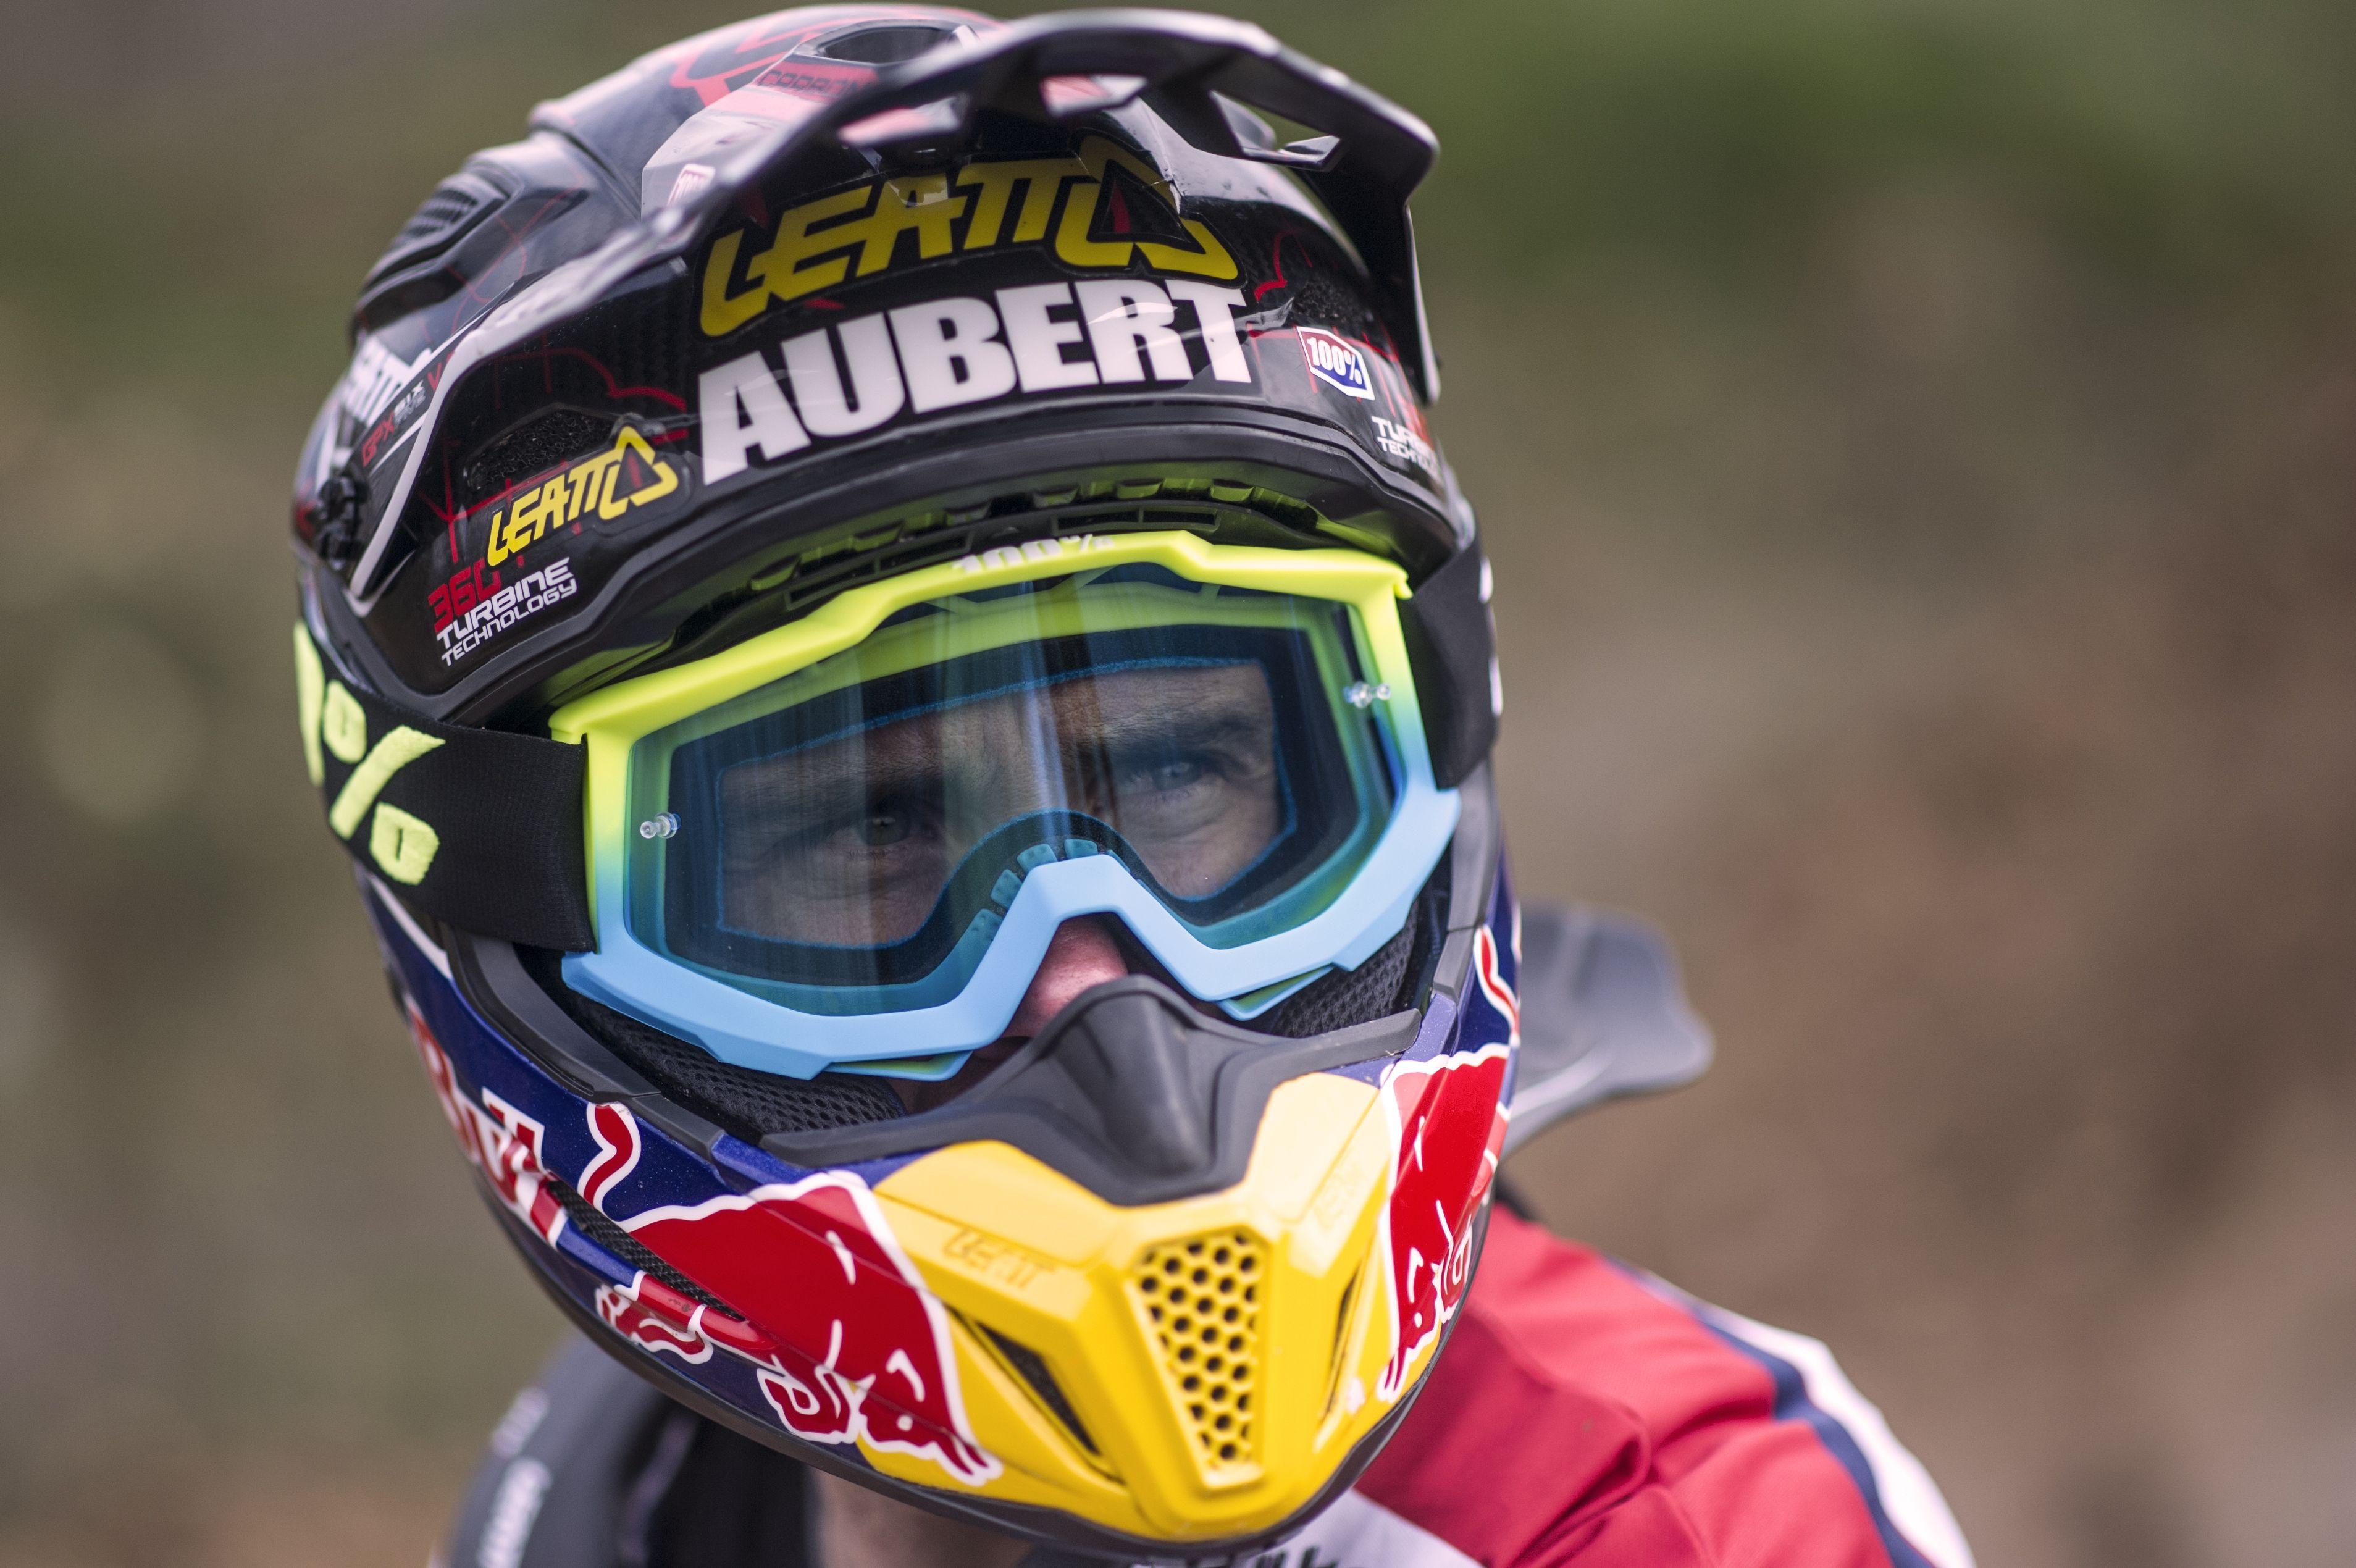 Johnny Aubert | Johnny Aubert | Motorcycle gear, Off road helmets